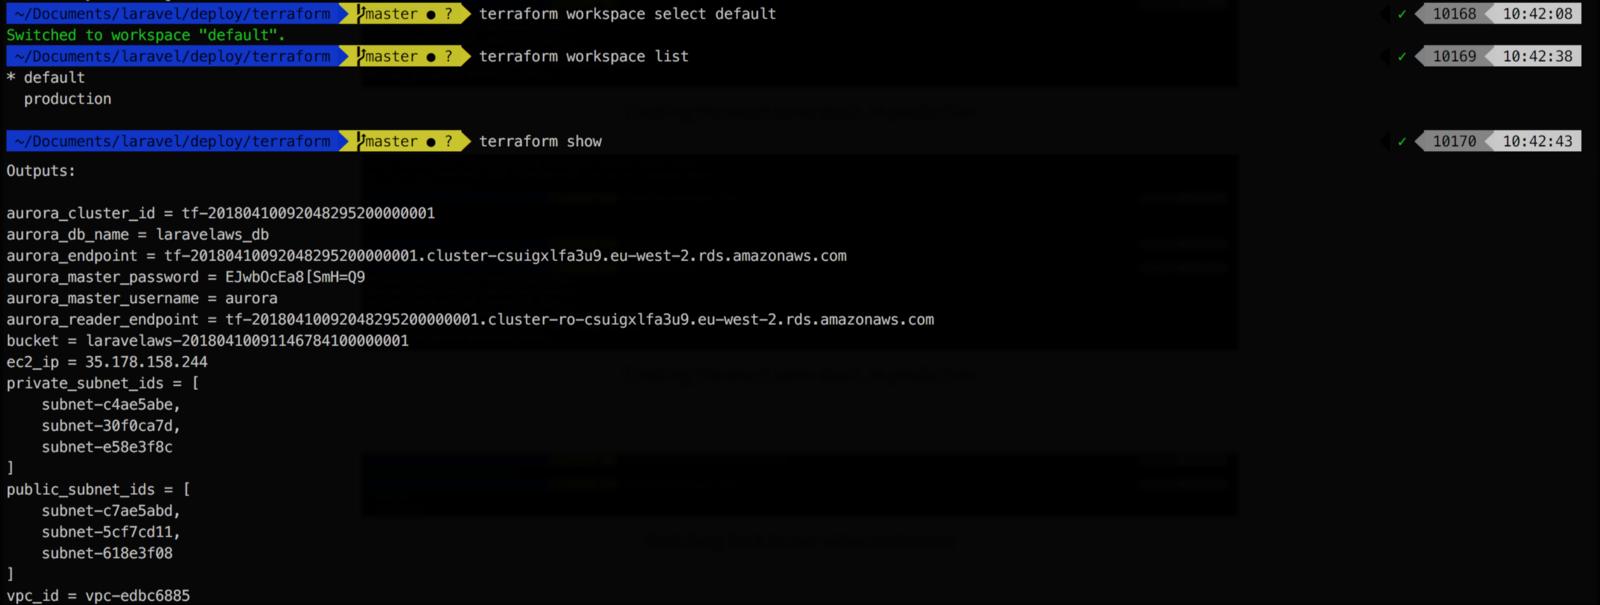 Stop manually provisioning AWS for Laravel — use Terraform